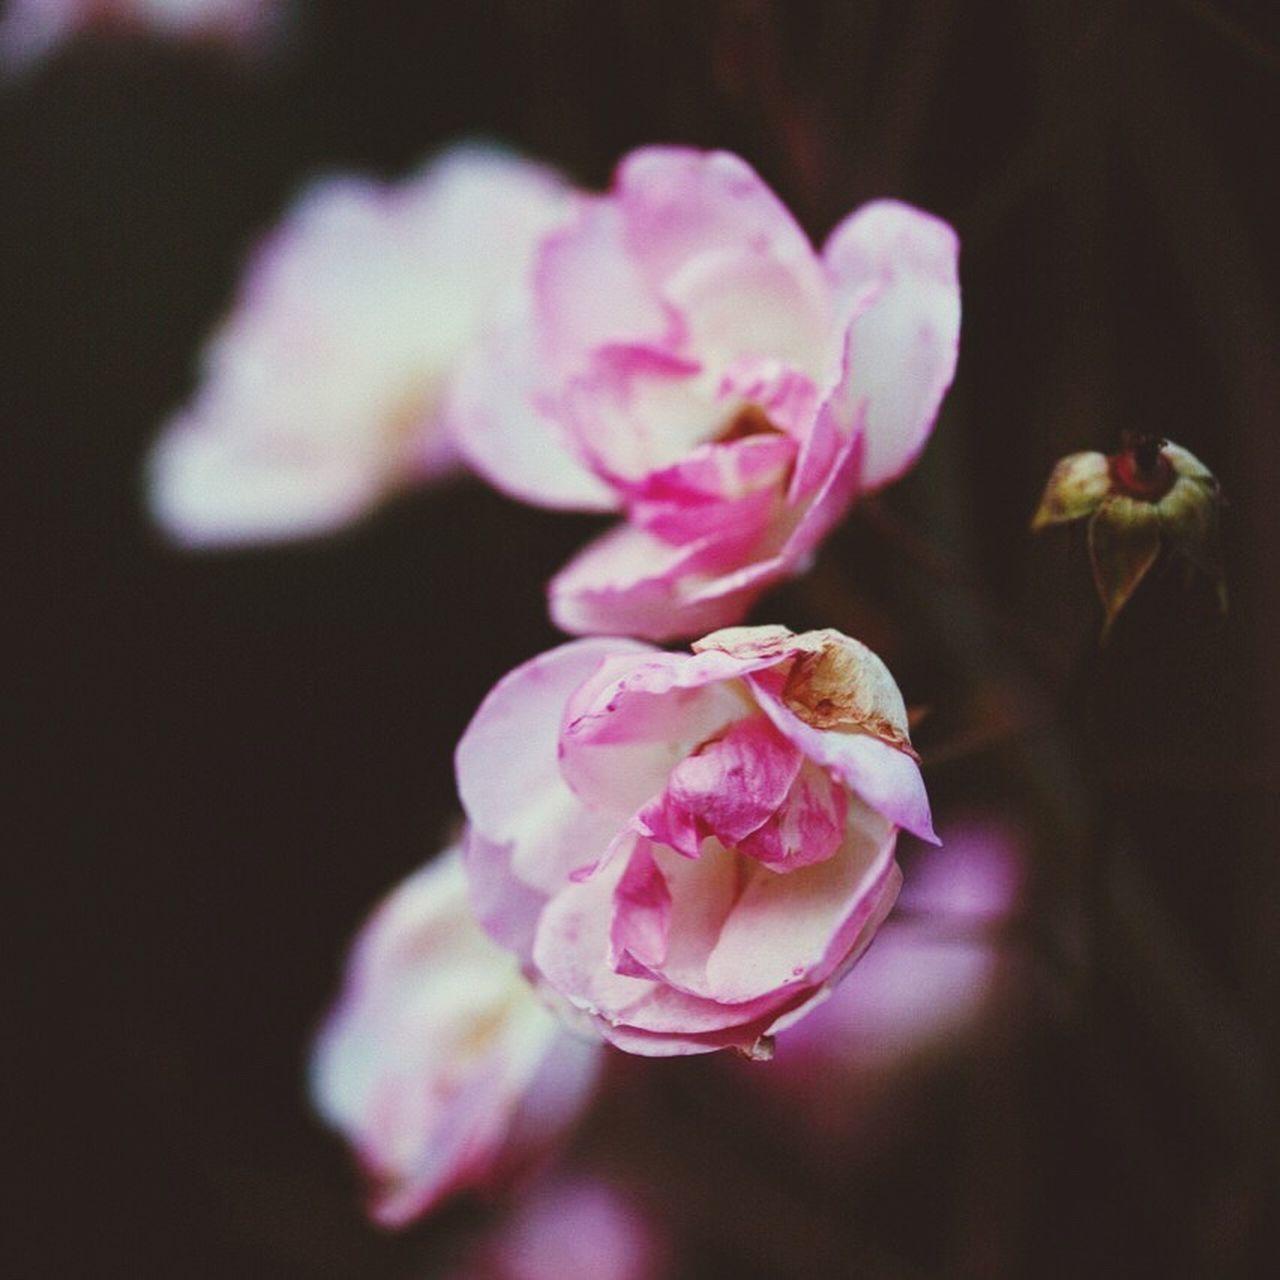 Maximum Closeness Beauty In Nature Flowers,Plants & Garden